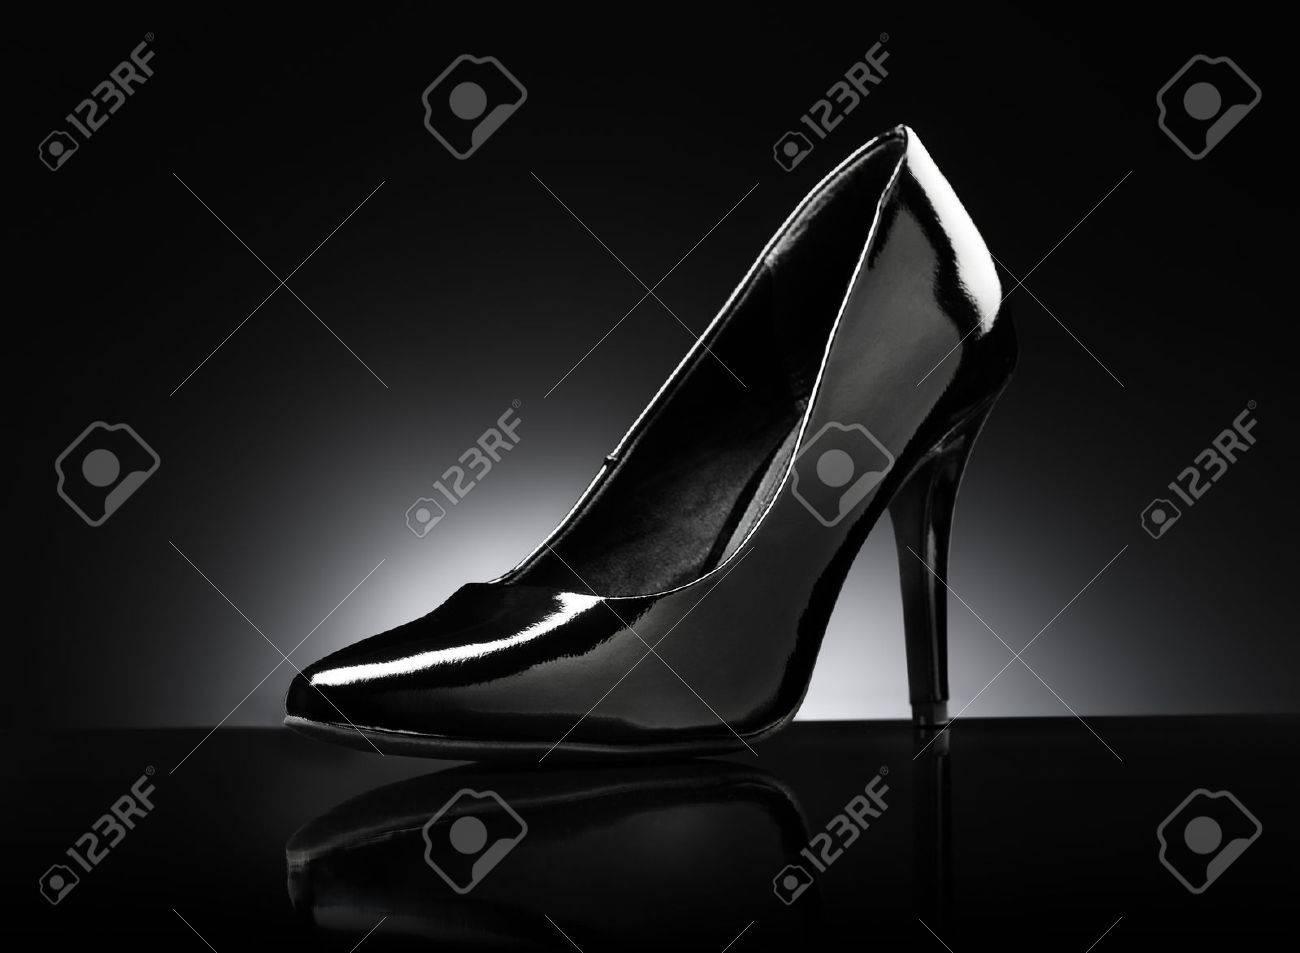 black glossy pumps